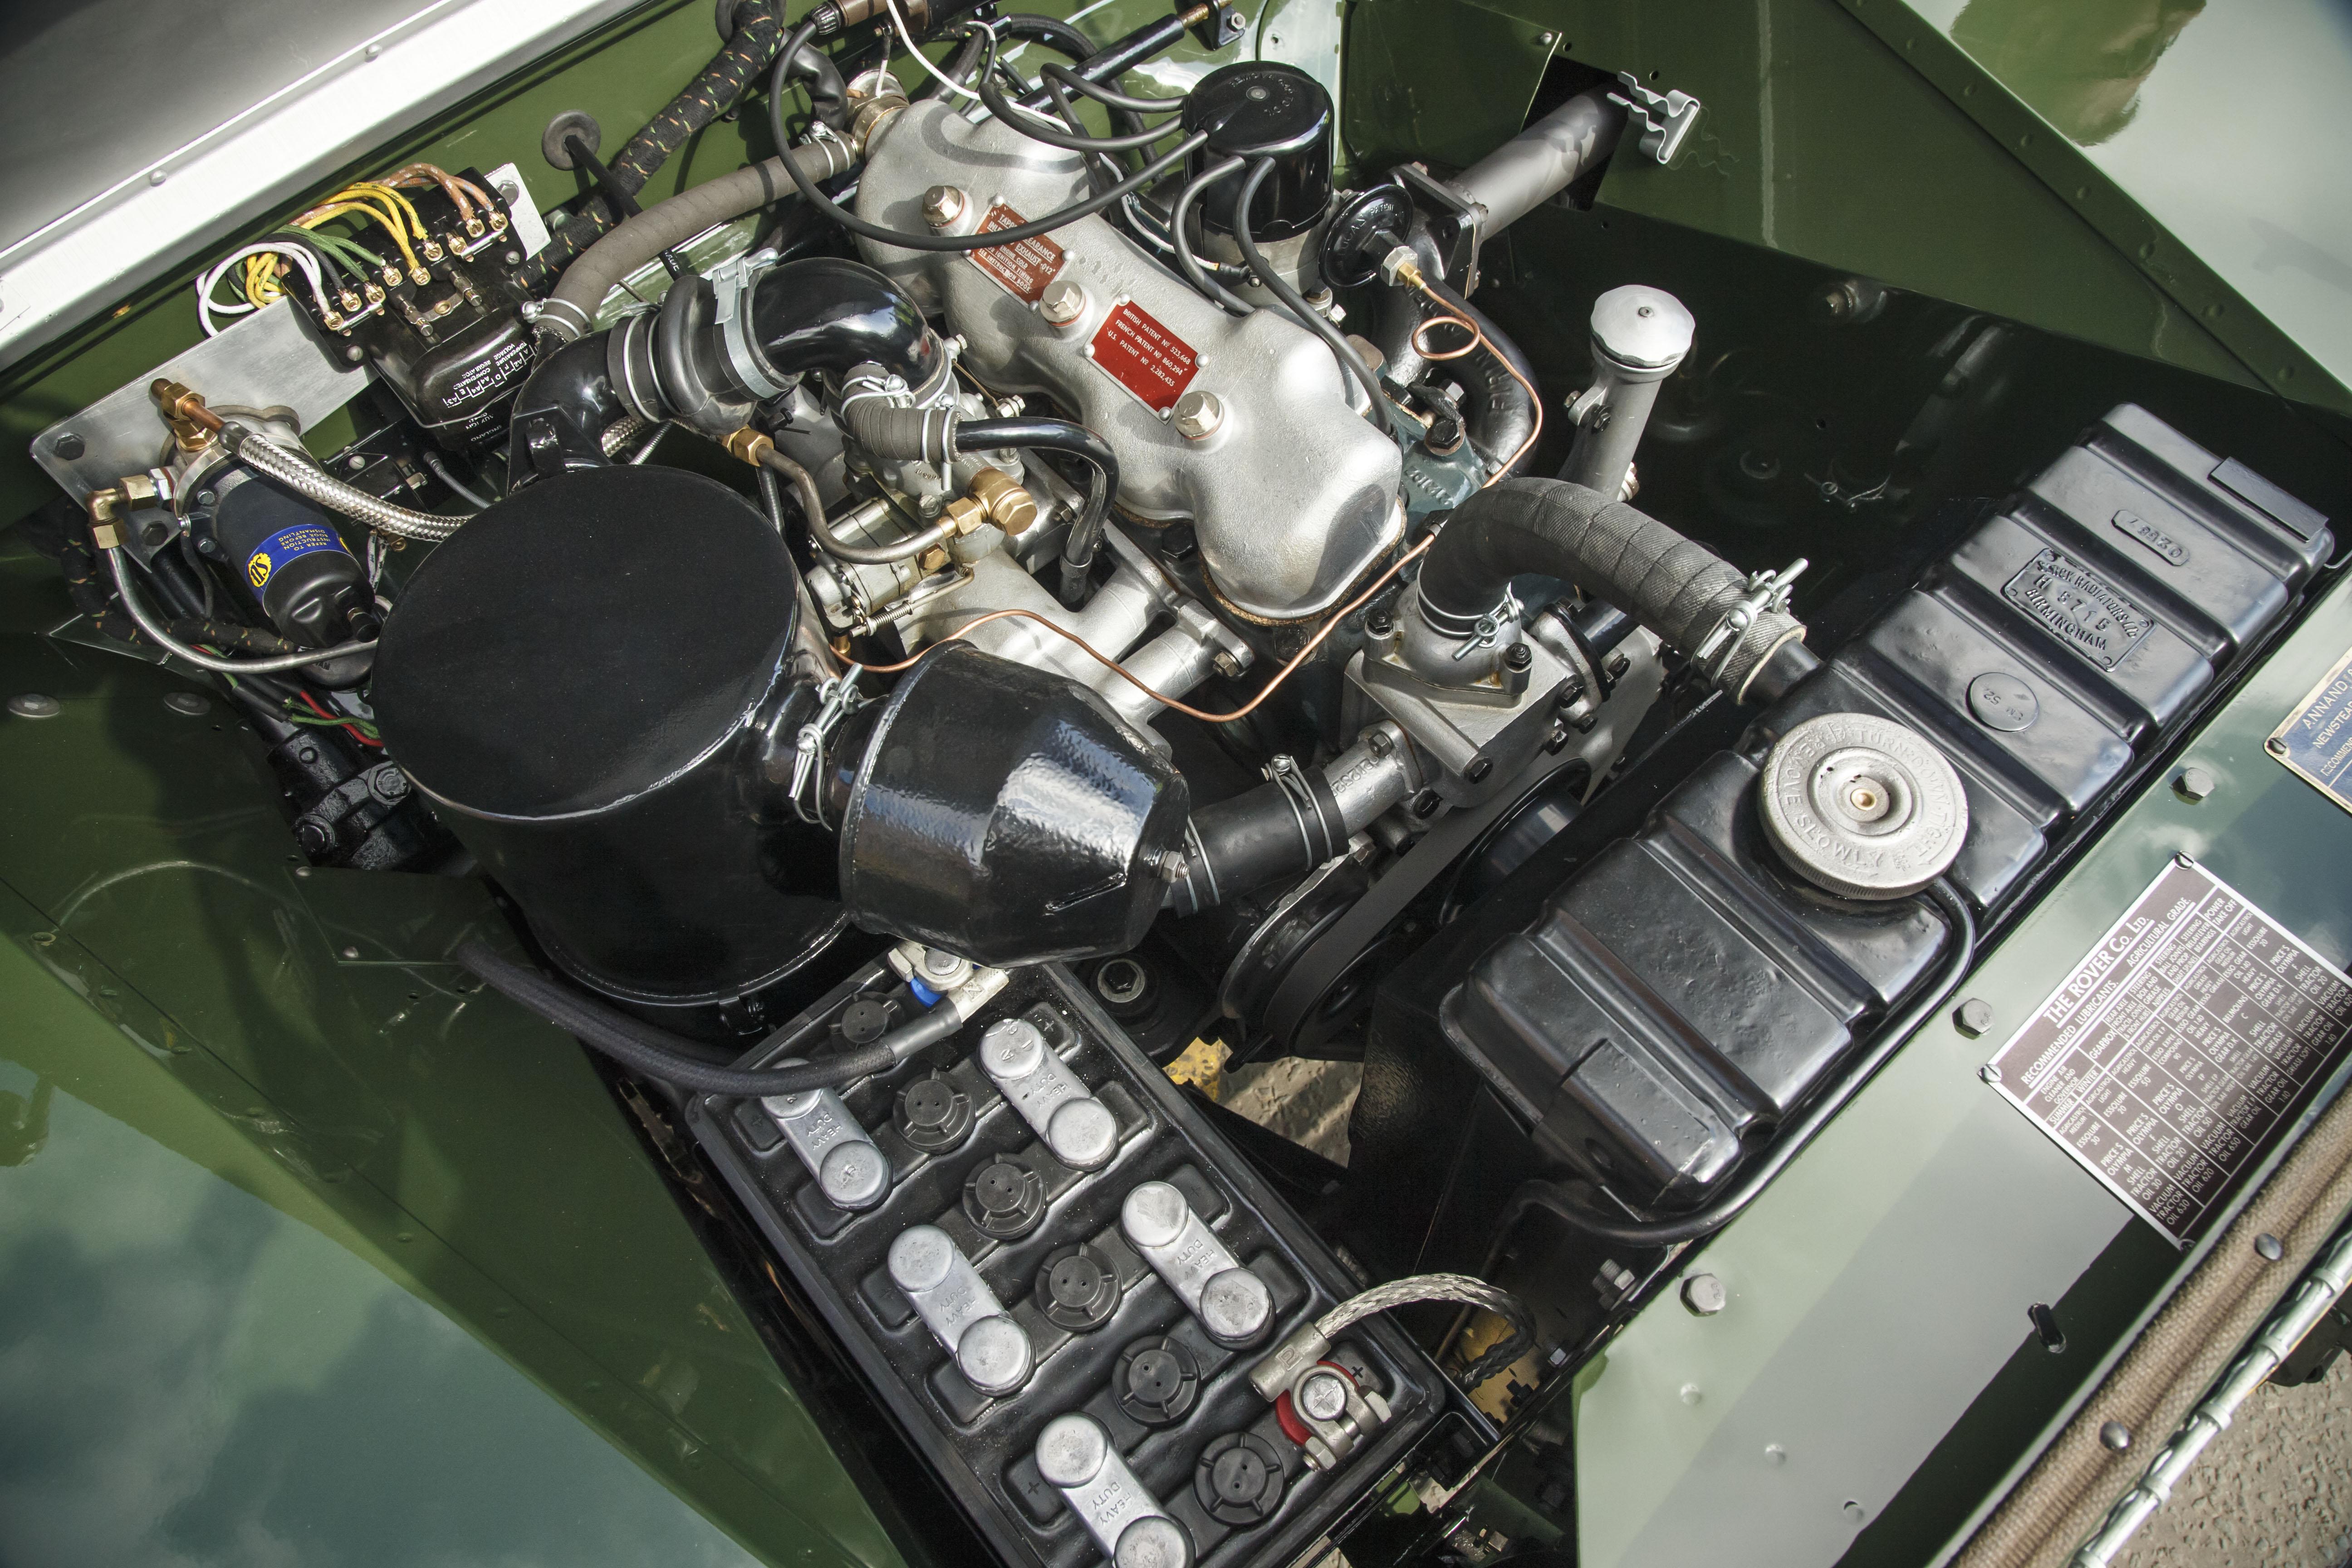 Land Rover Série 1 motor